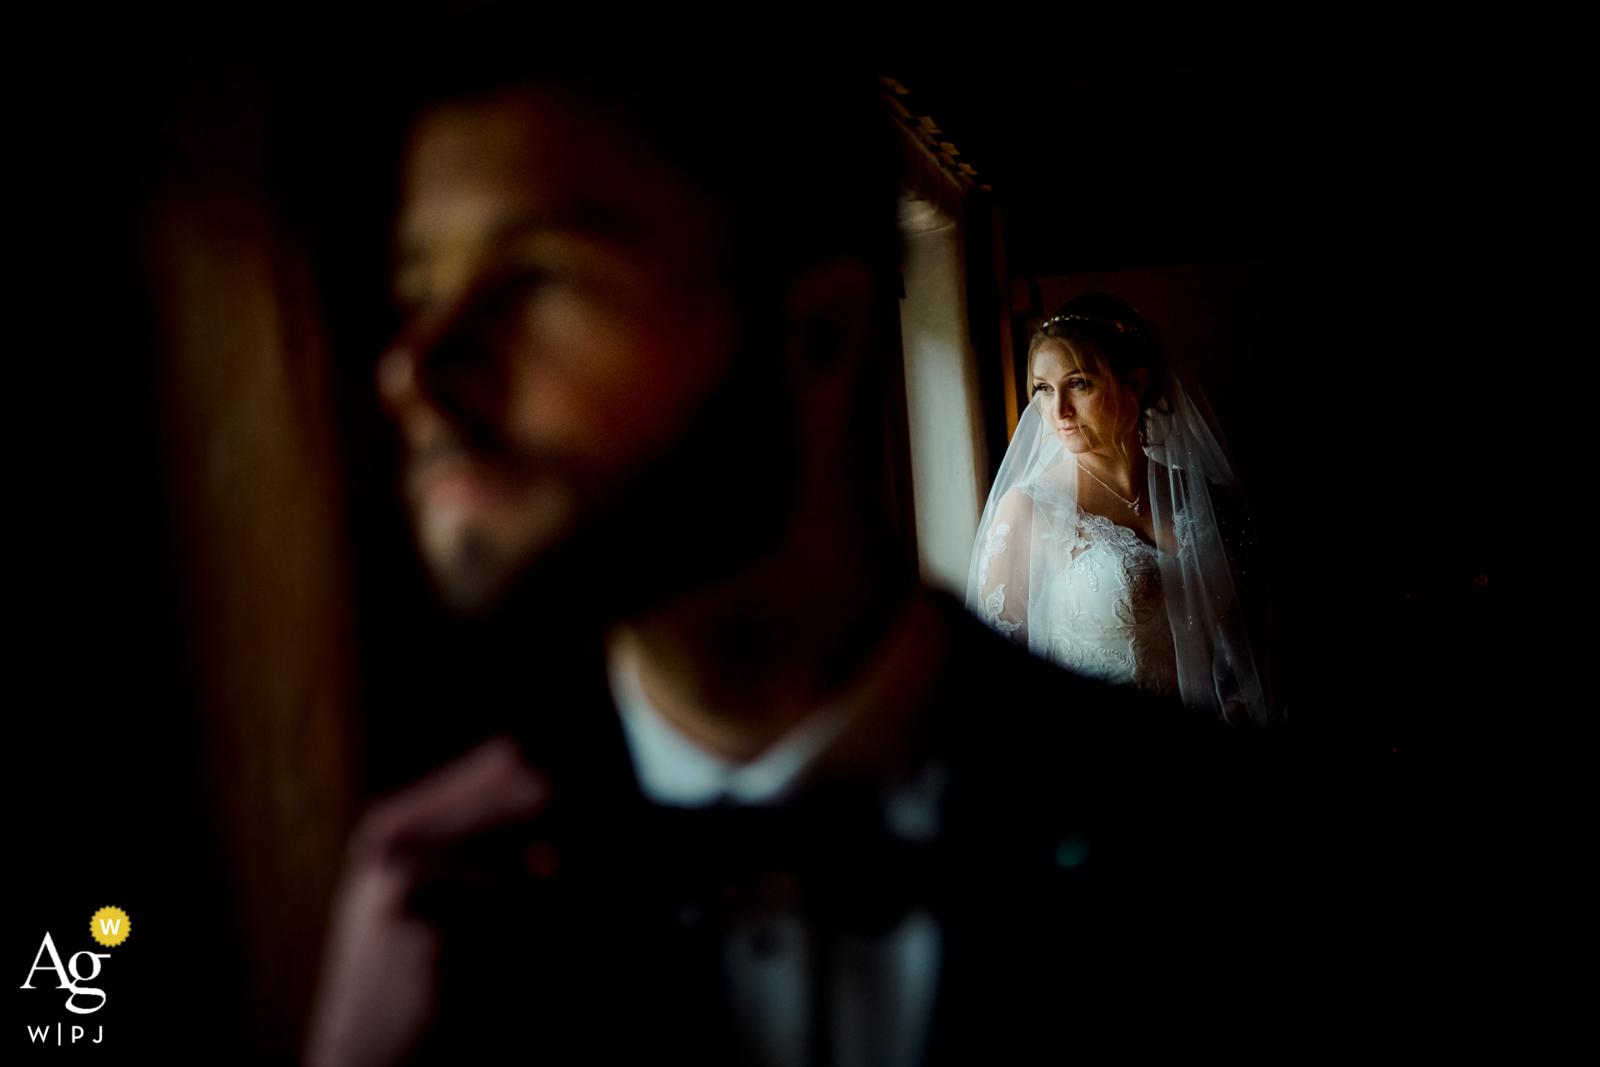 Sonthofen creative couple wedding portrait in some soft window light